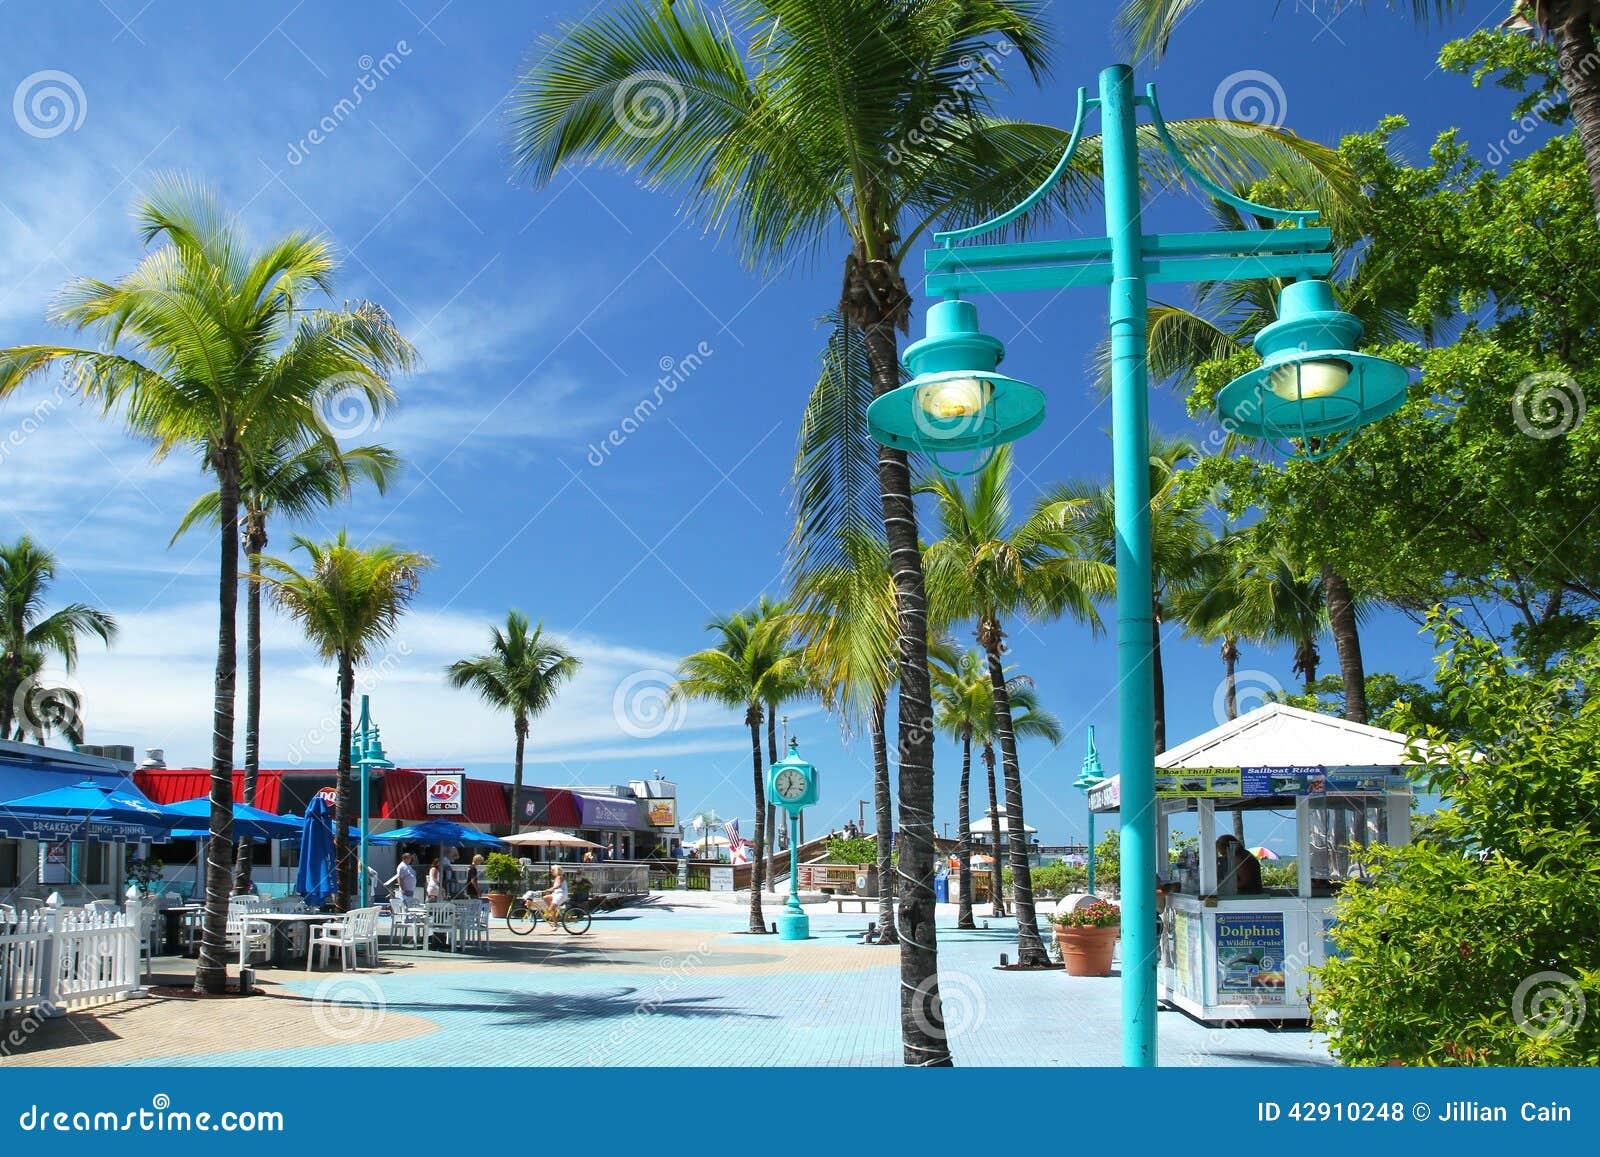 Estero Island Florida Restaurants